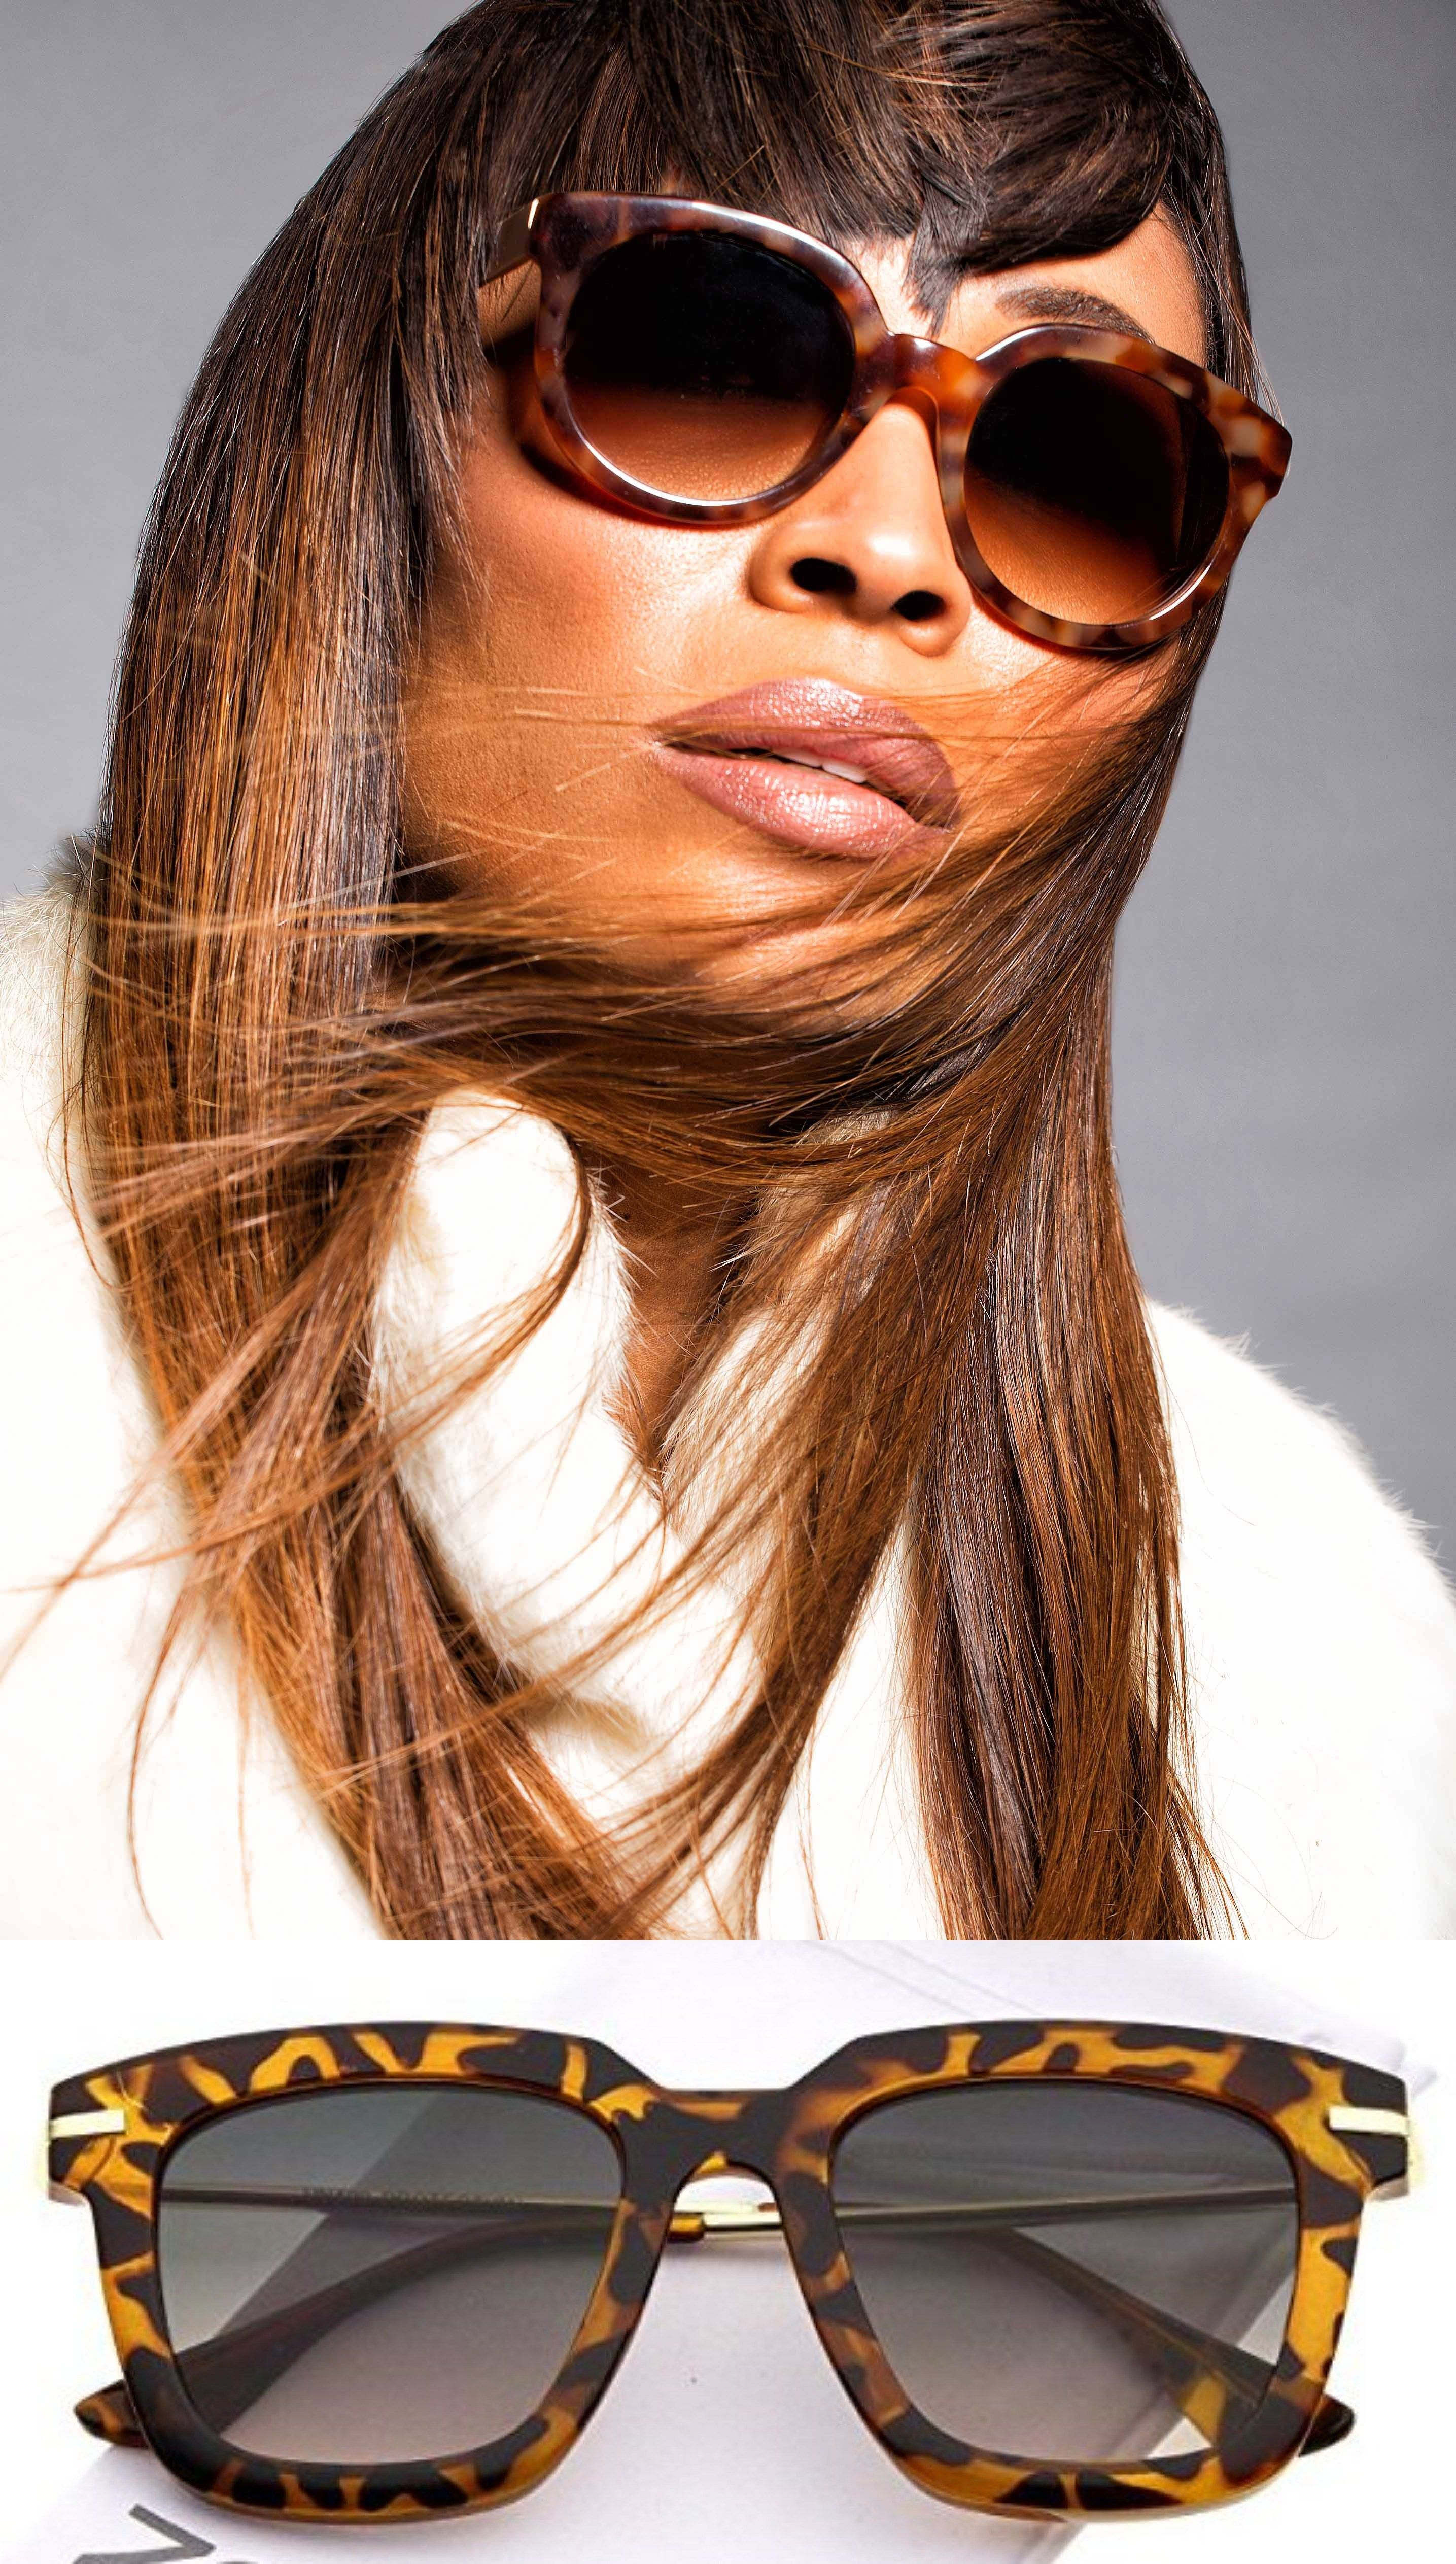 Cynthia Bailey Sunglasses Fancy Hot Chic Styles